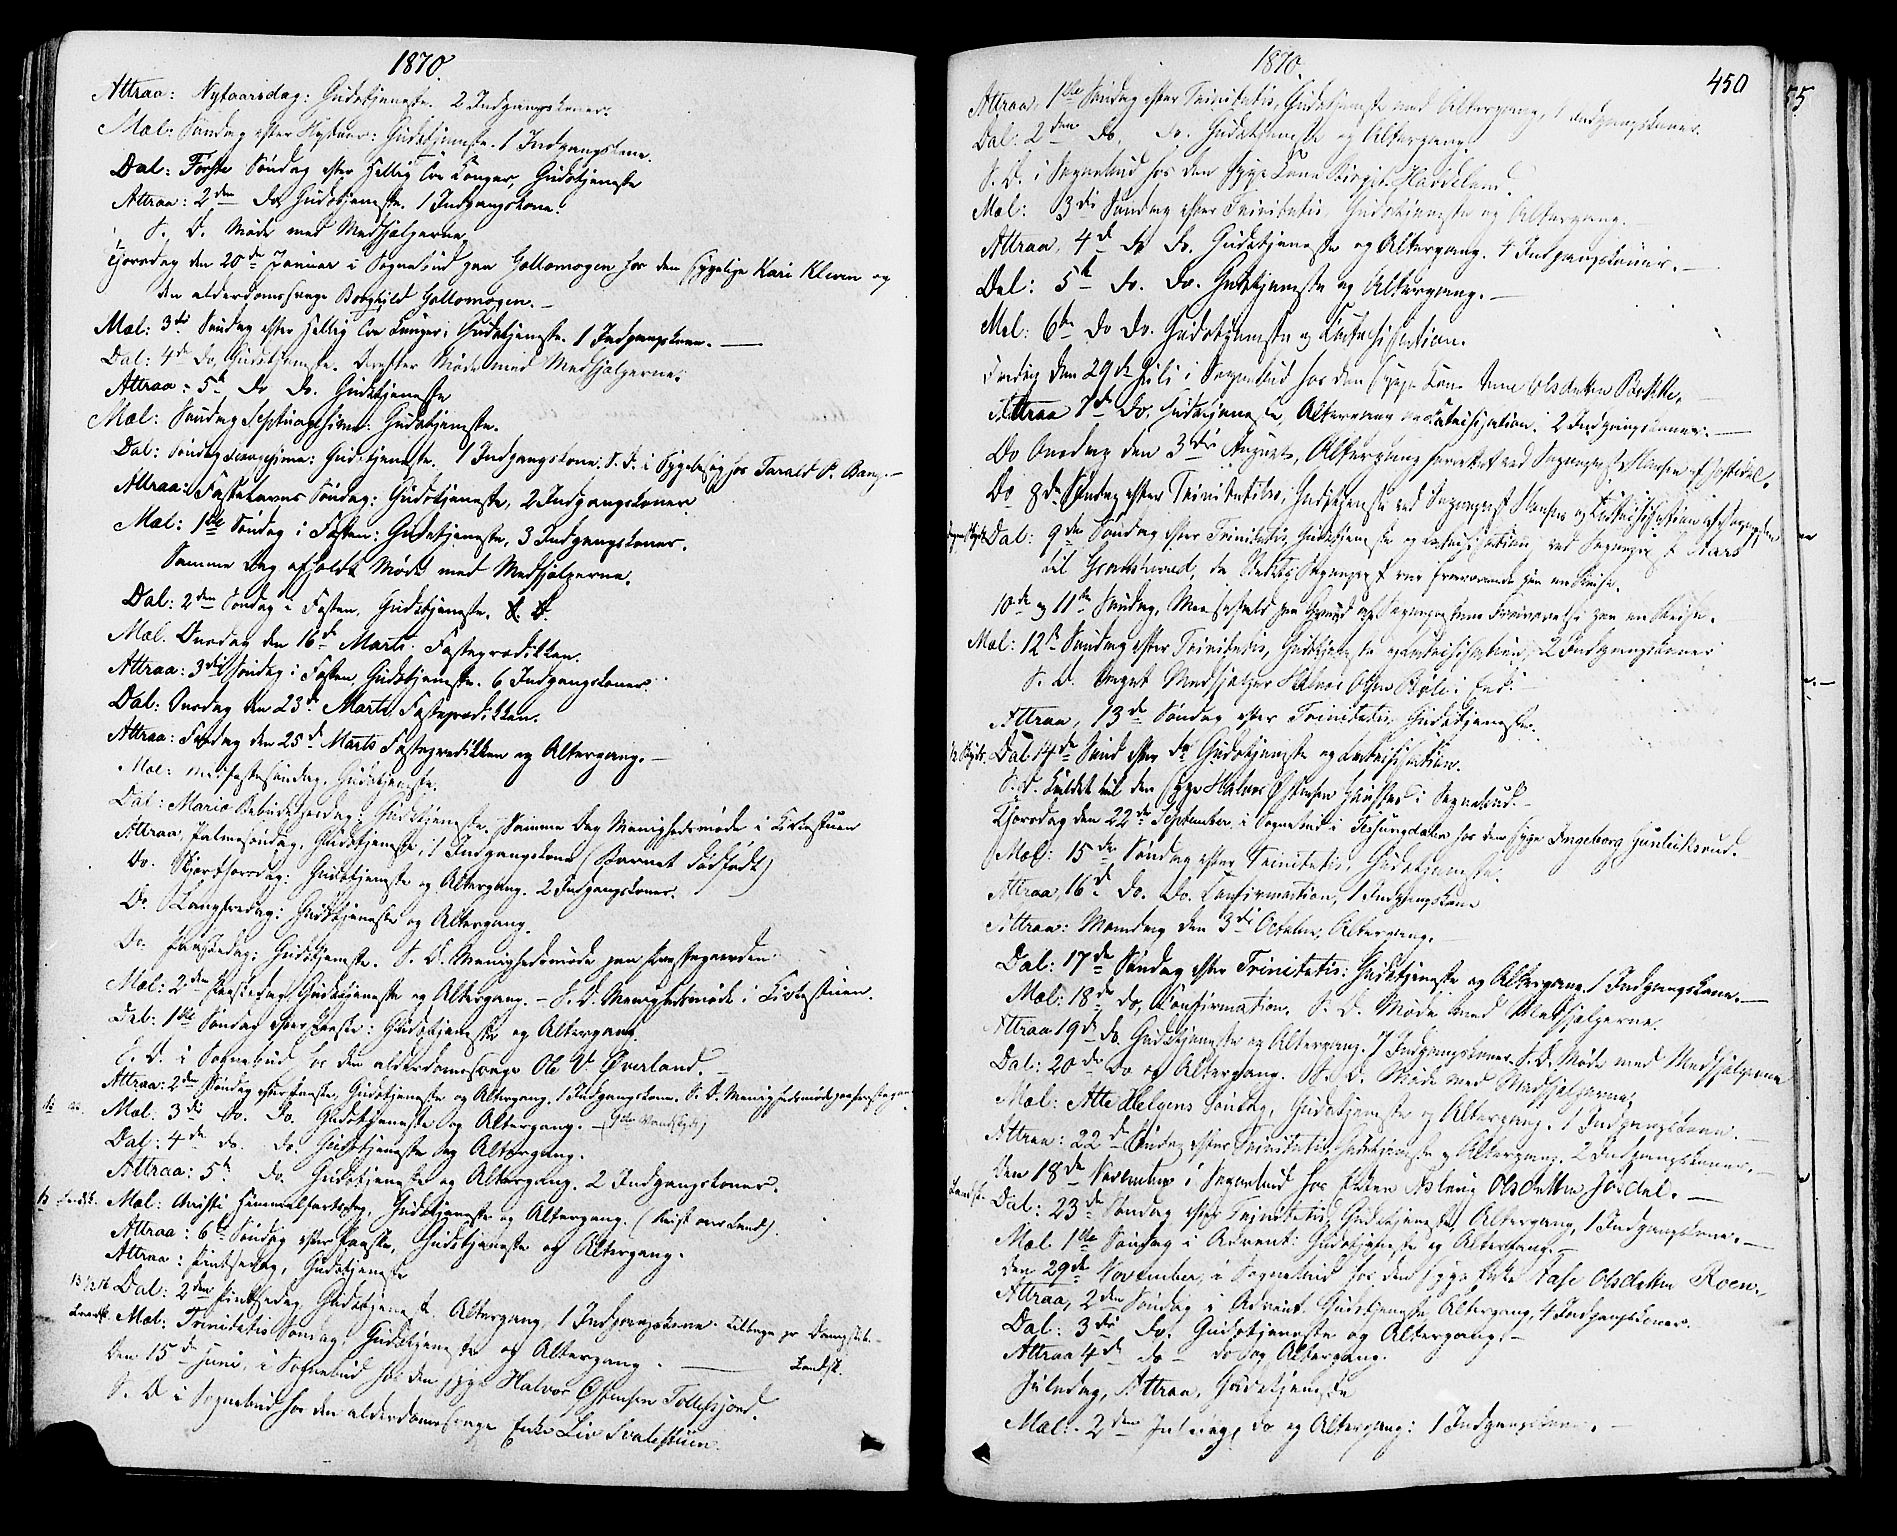 SAKO, Tinn kirkebøker, F/Fa/L0006: Ministerialbok nr. I 6, 1857-1878, s. 450